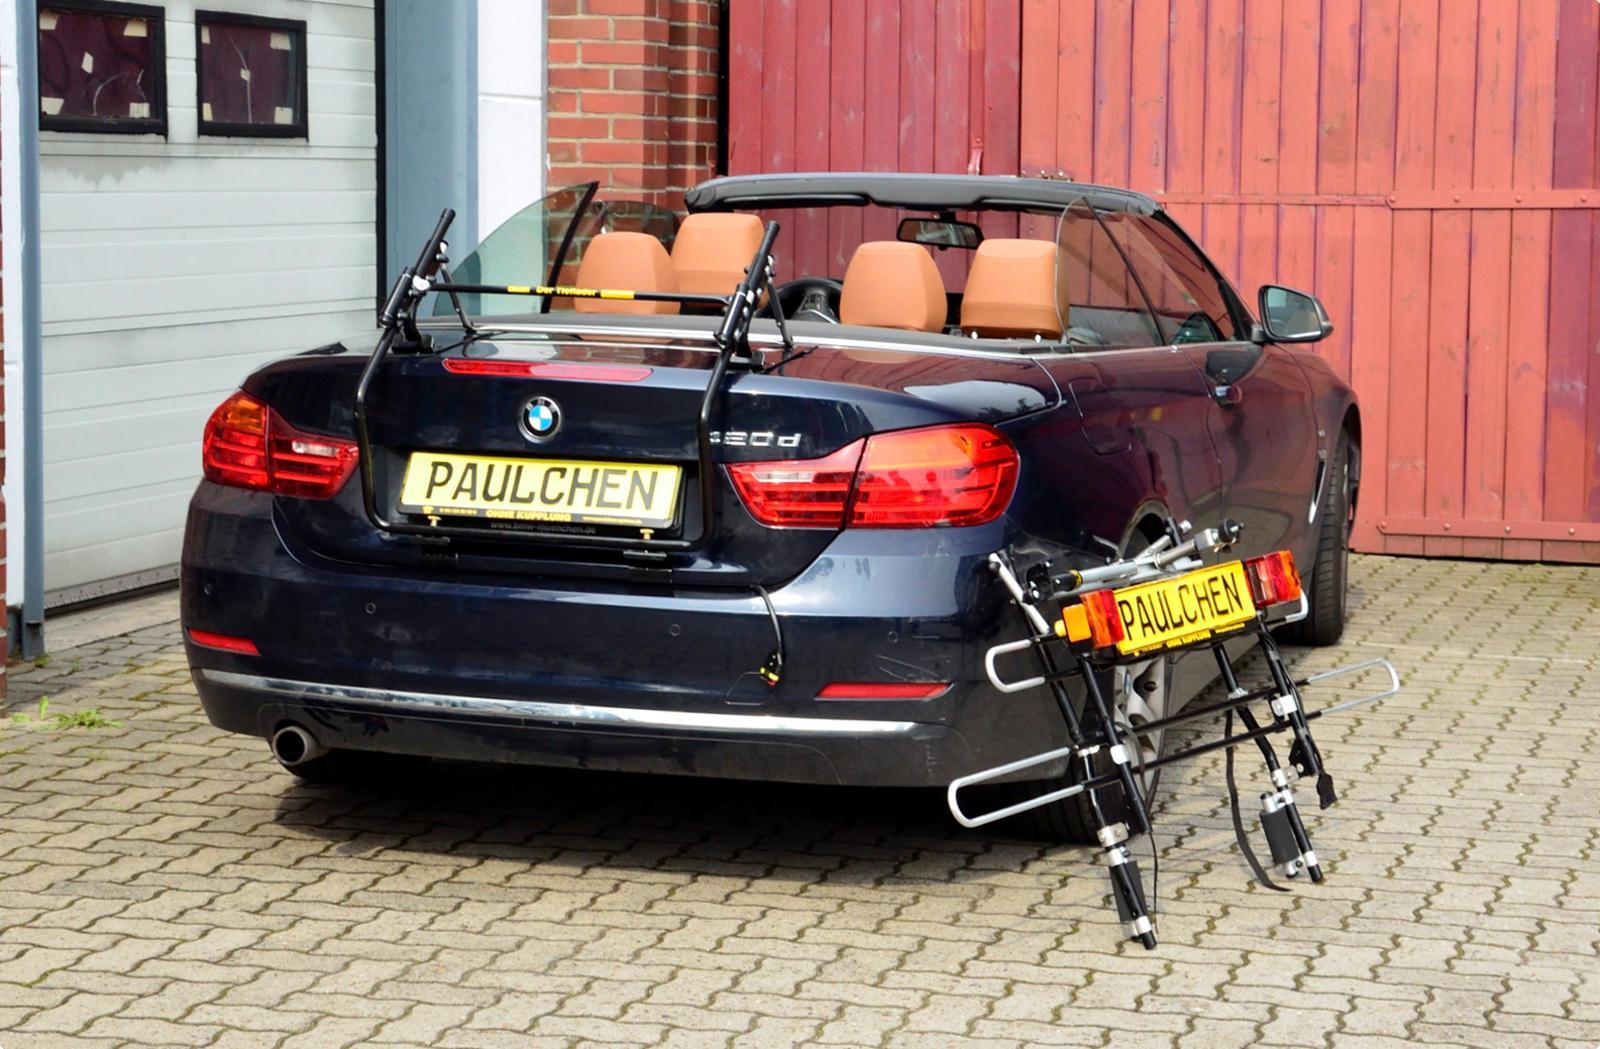 fahrradtr ger f r bmw 4er cabrio f33 paulchen hecktr ger system fahrradtr ger. Black Bedroom Furniture Sets. Home Design Ideas